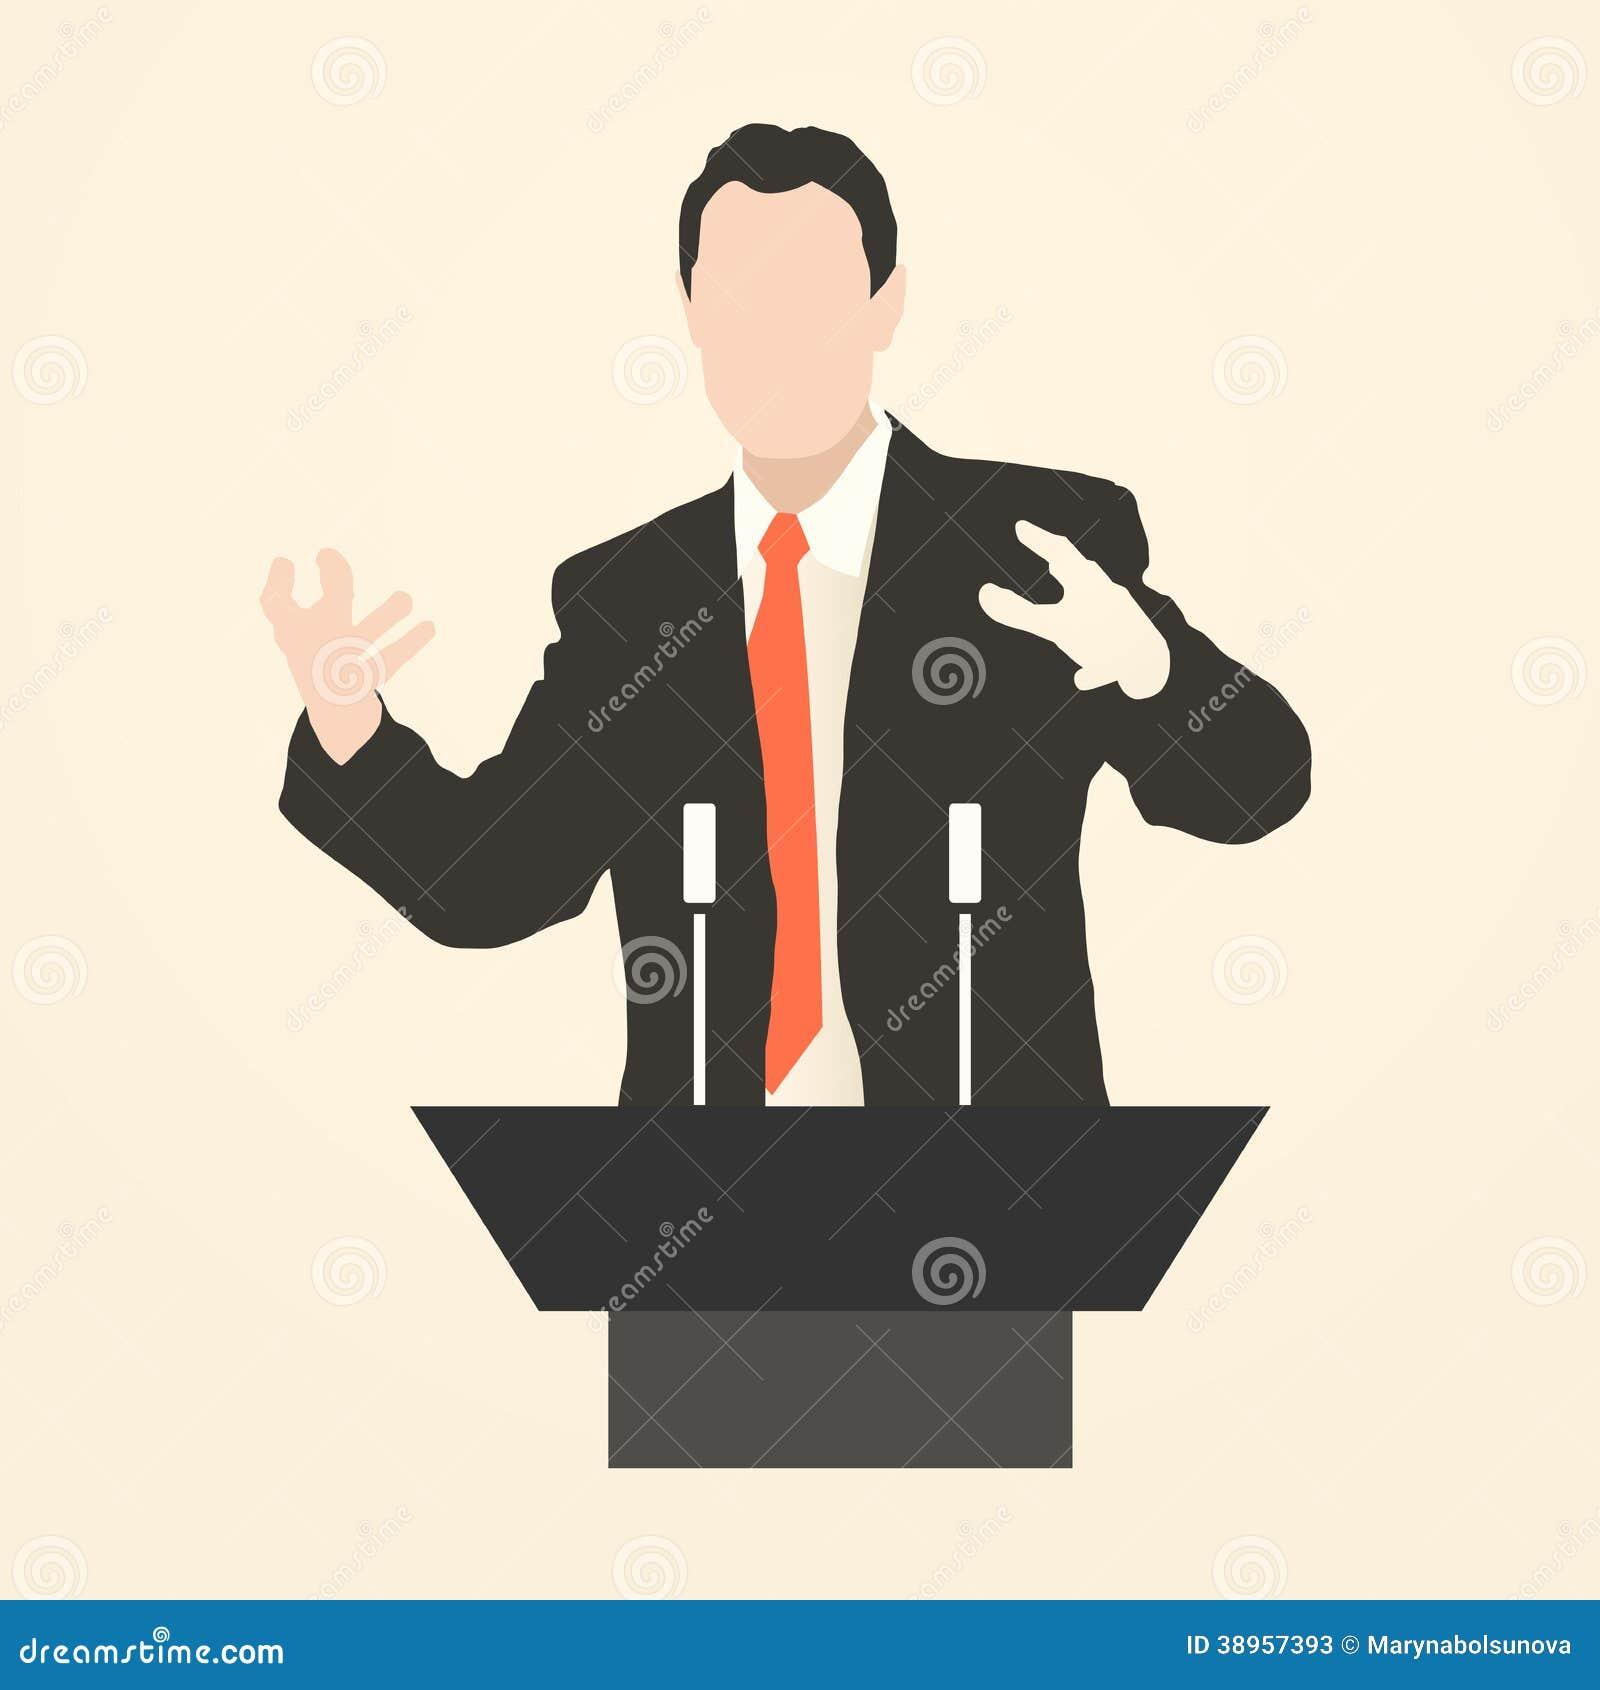 Orator Speaking From Tribune Stock Illustration - Image: 38957393